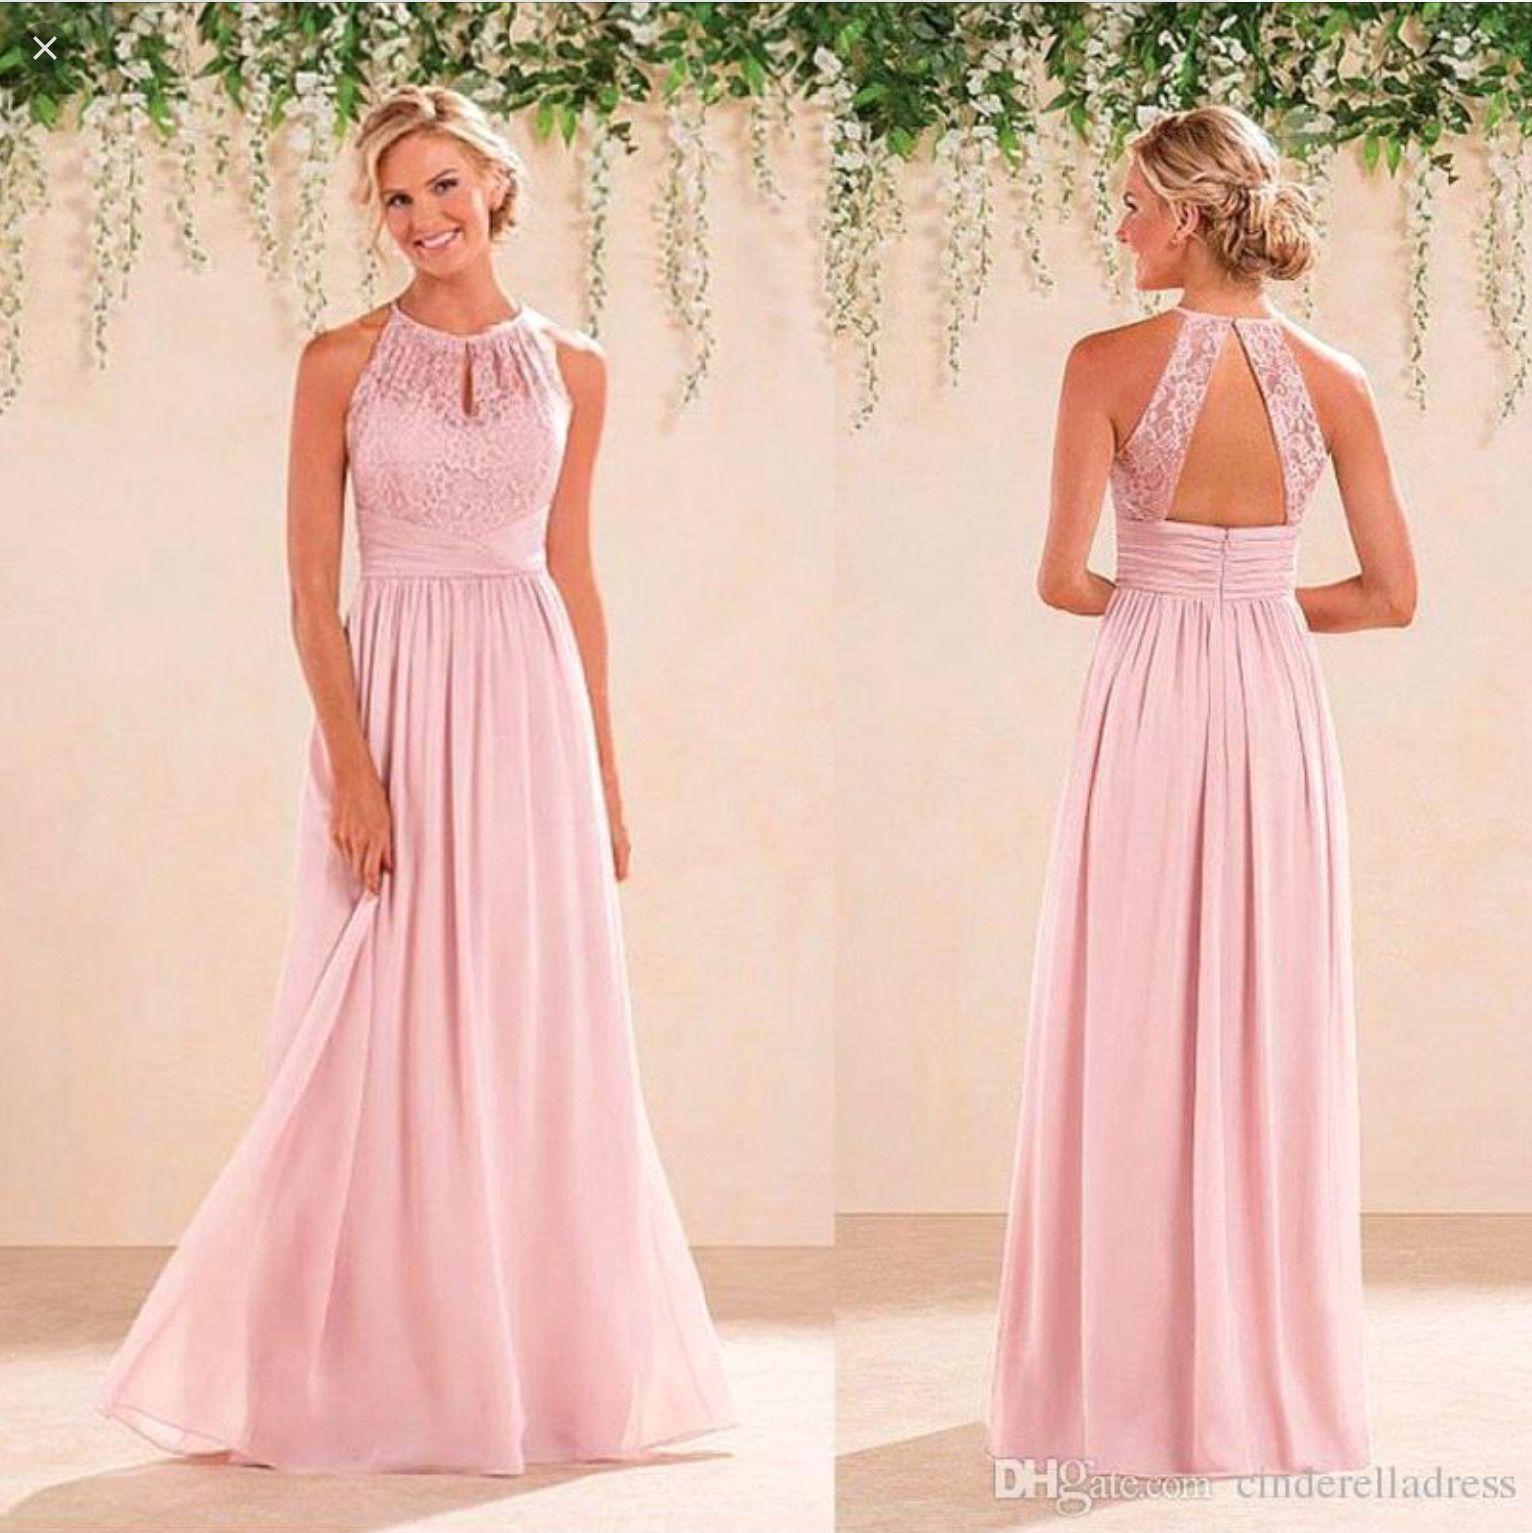 Peach dress for wedding guest  Pin by Ali Maloney on Sarahus wedding  Pinterest  Weddings